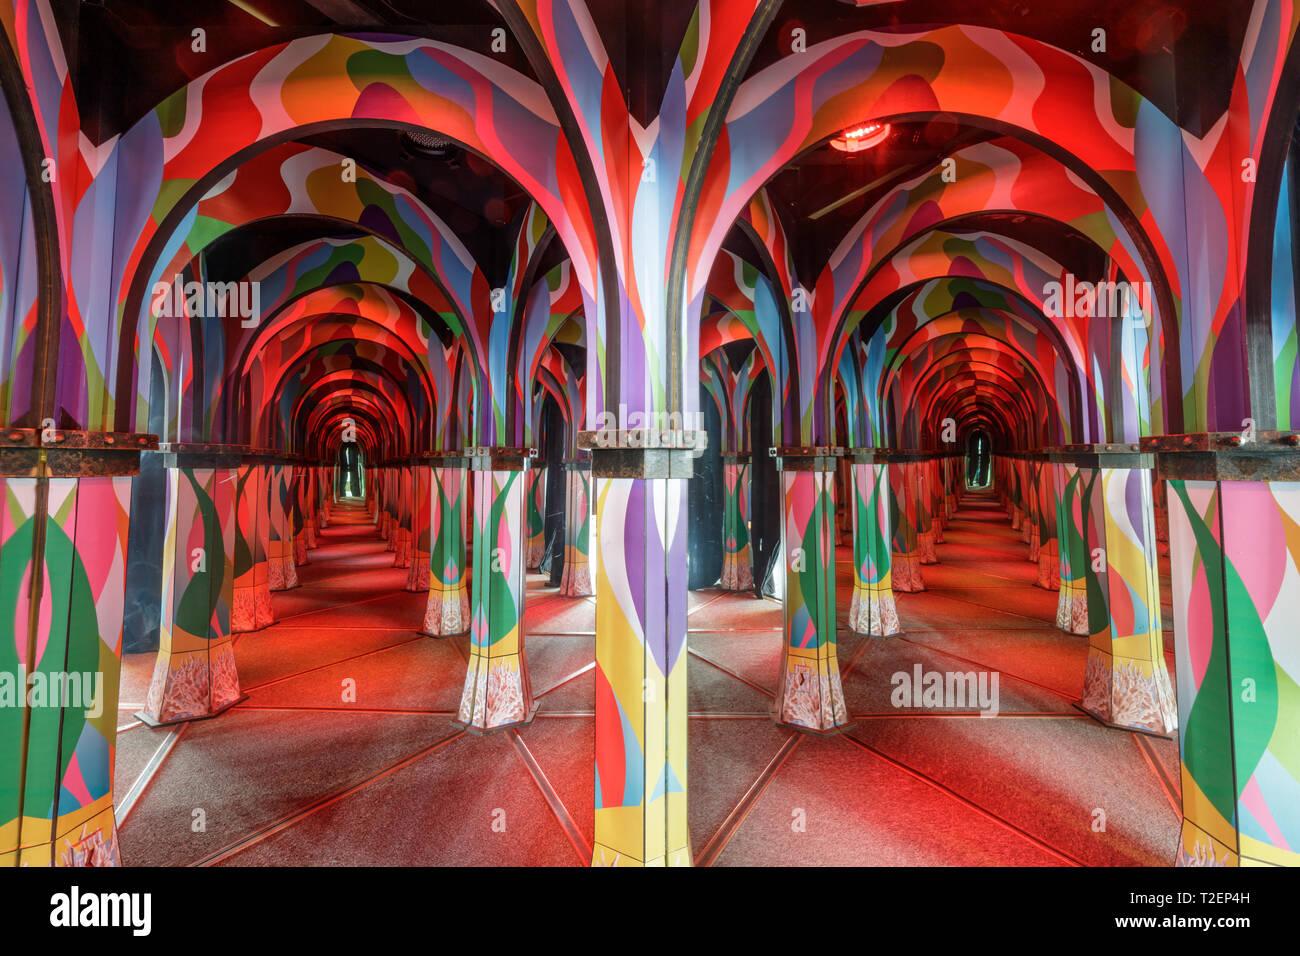 Monterey, California - March 31, 2019: Inside The Monterey Mirror Maze. - Stock Image